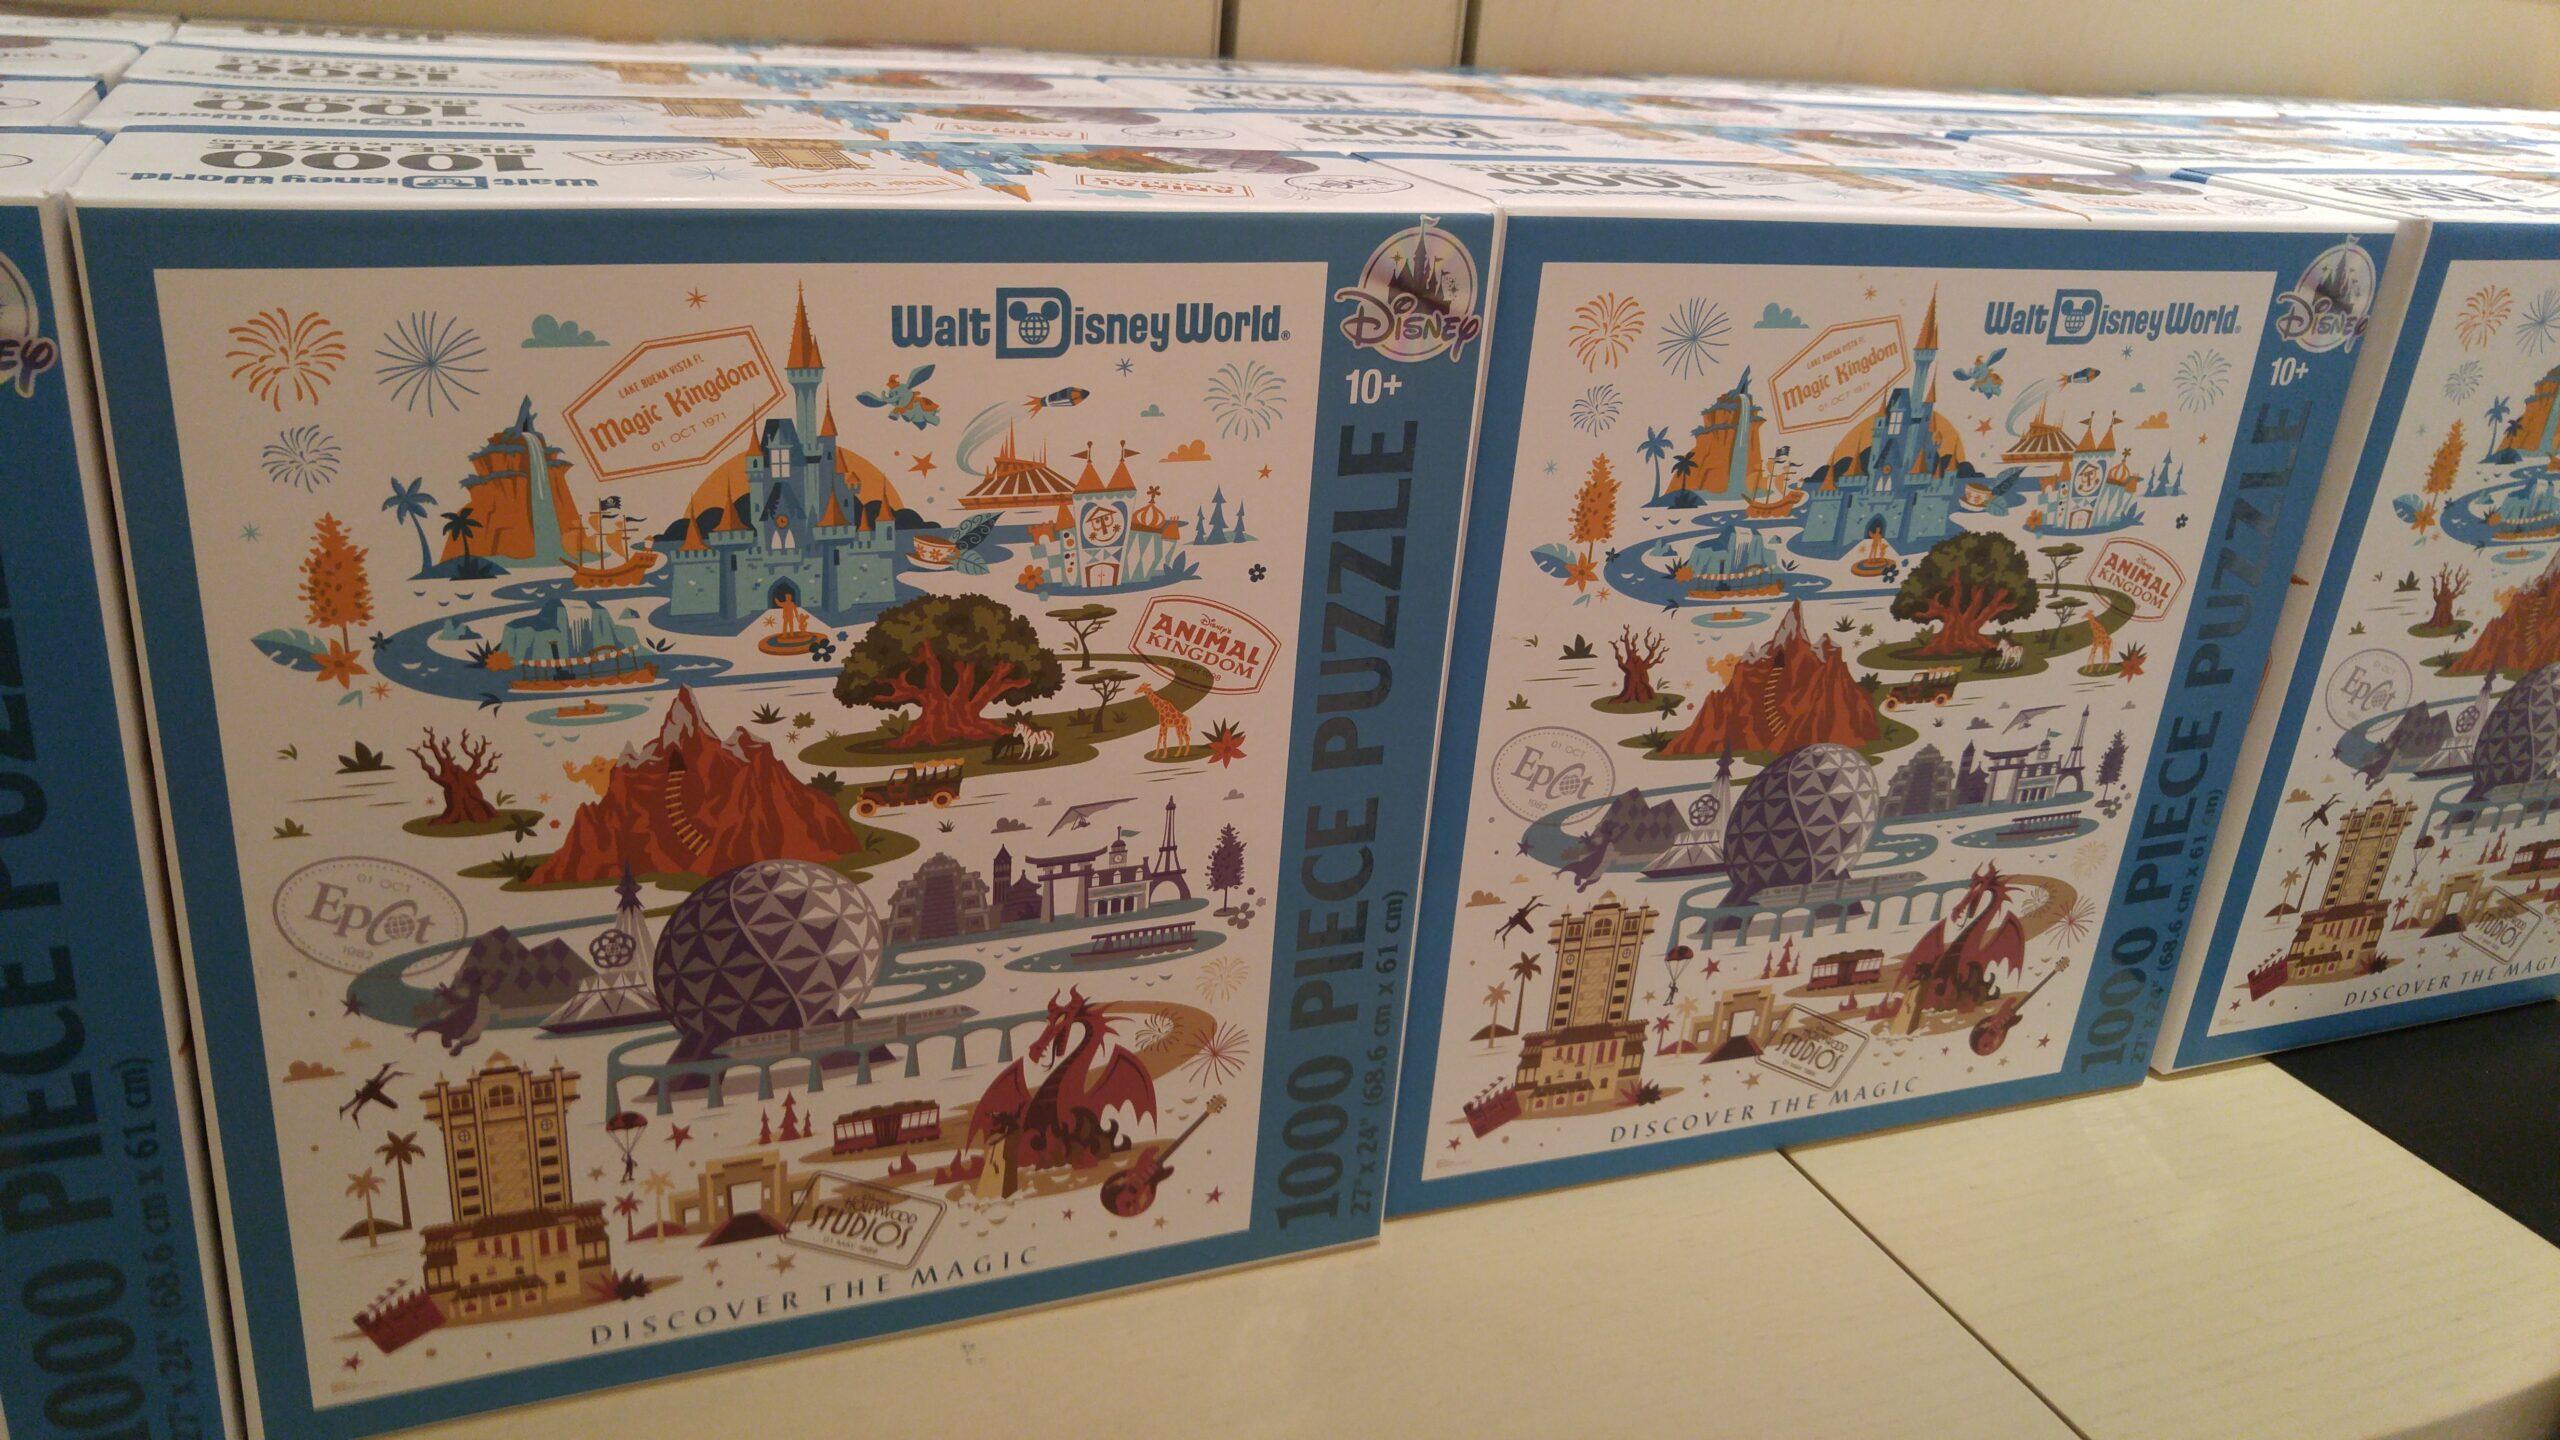 Walt Disney World 1000 Piece Puzzle